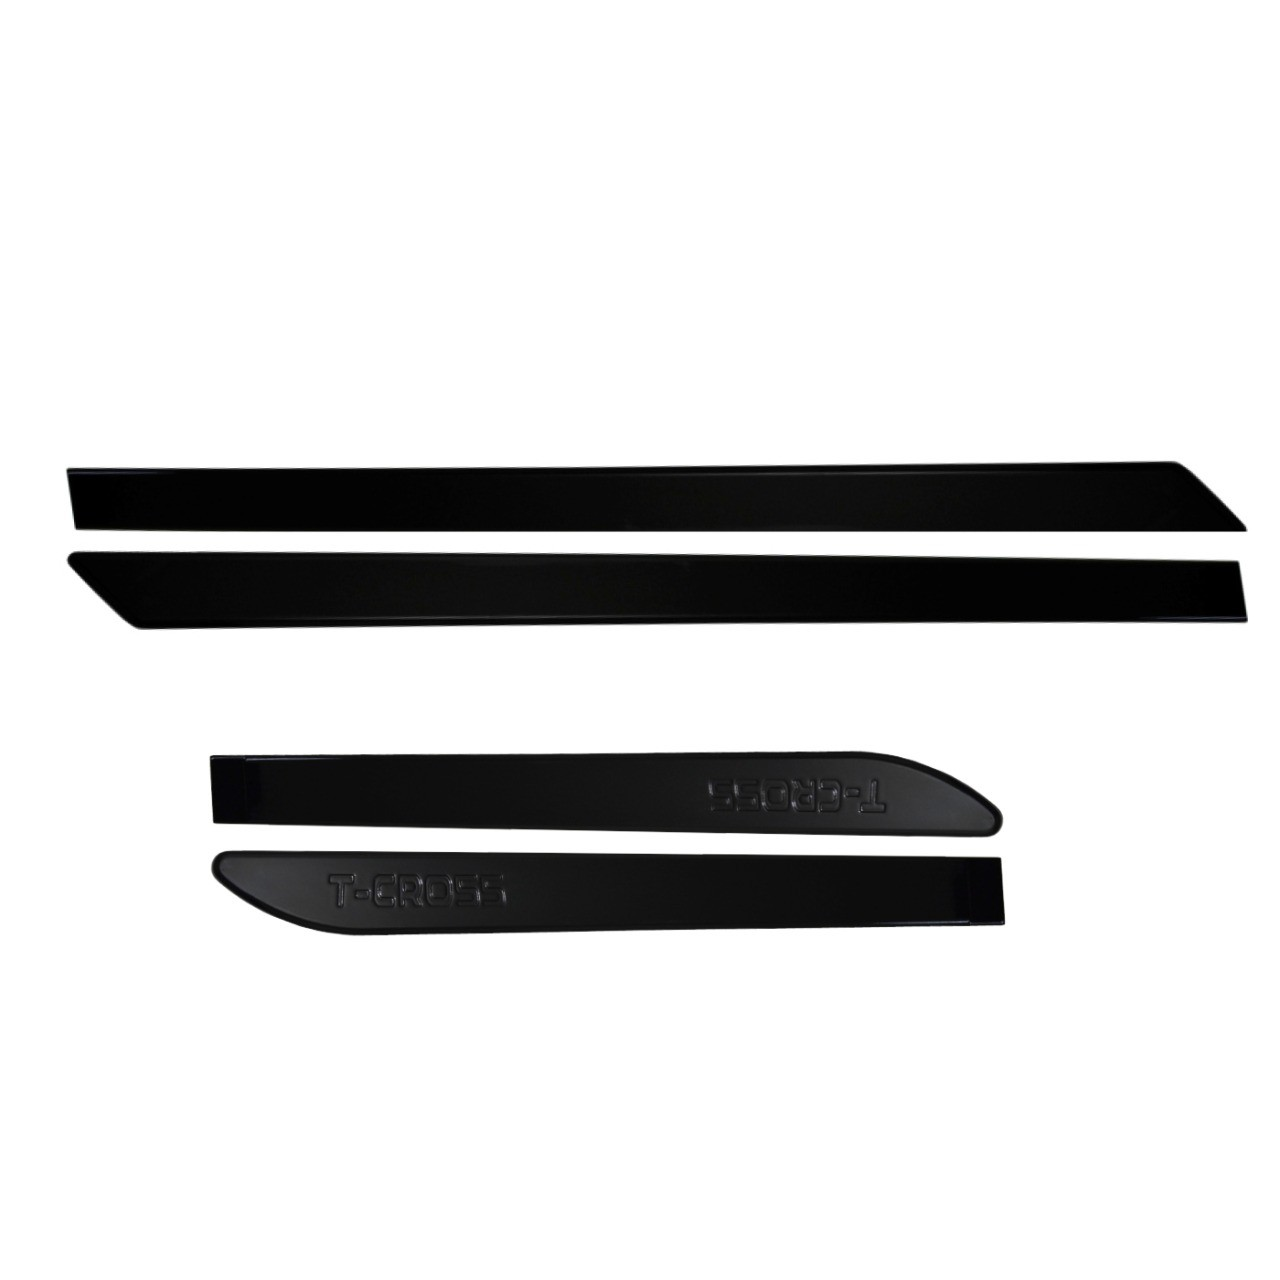 Friso Lateral T-Cross Preto Ninja com nome em baixo relevo